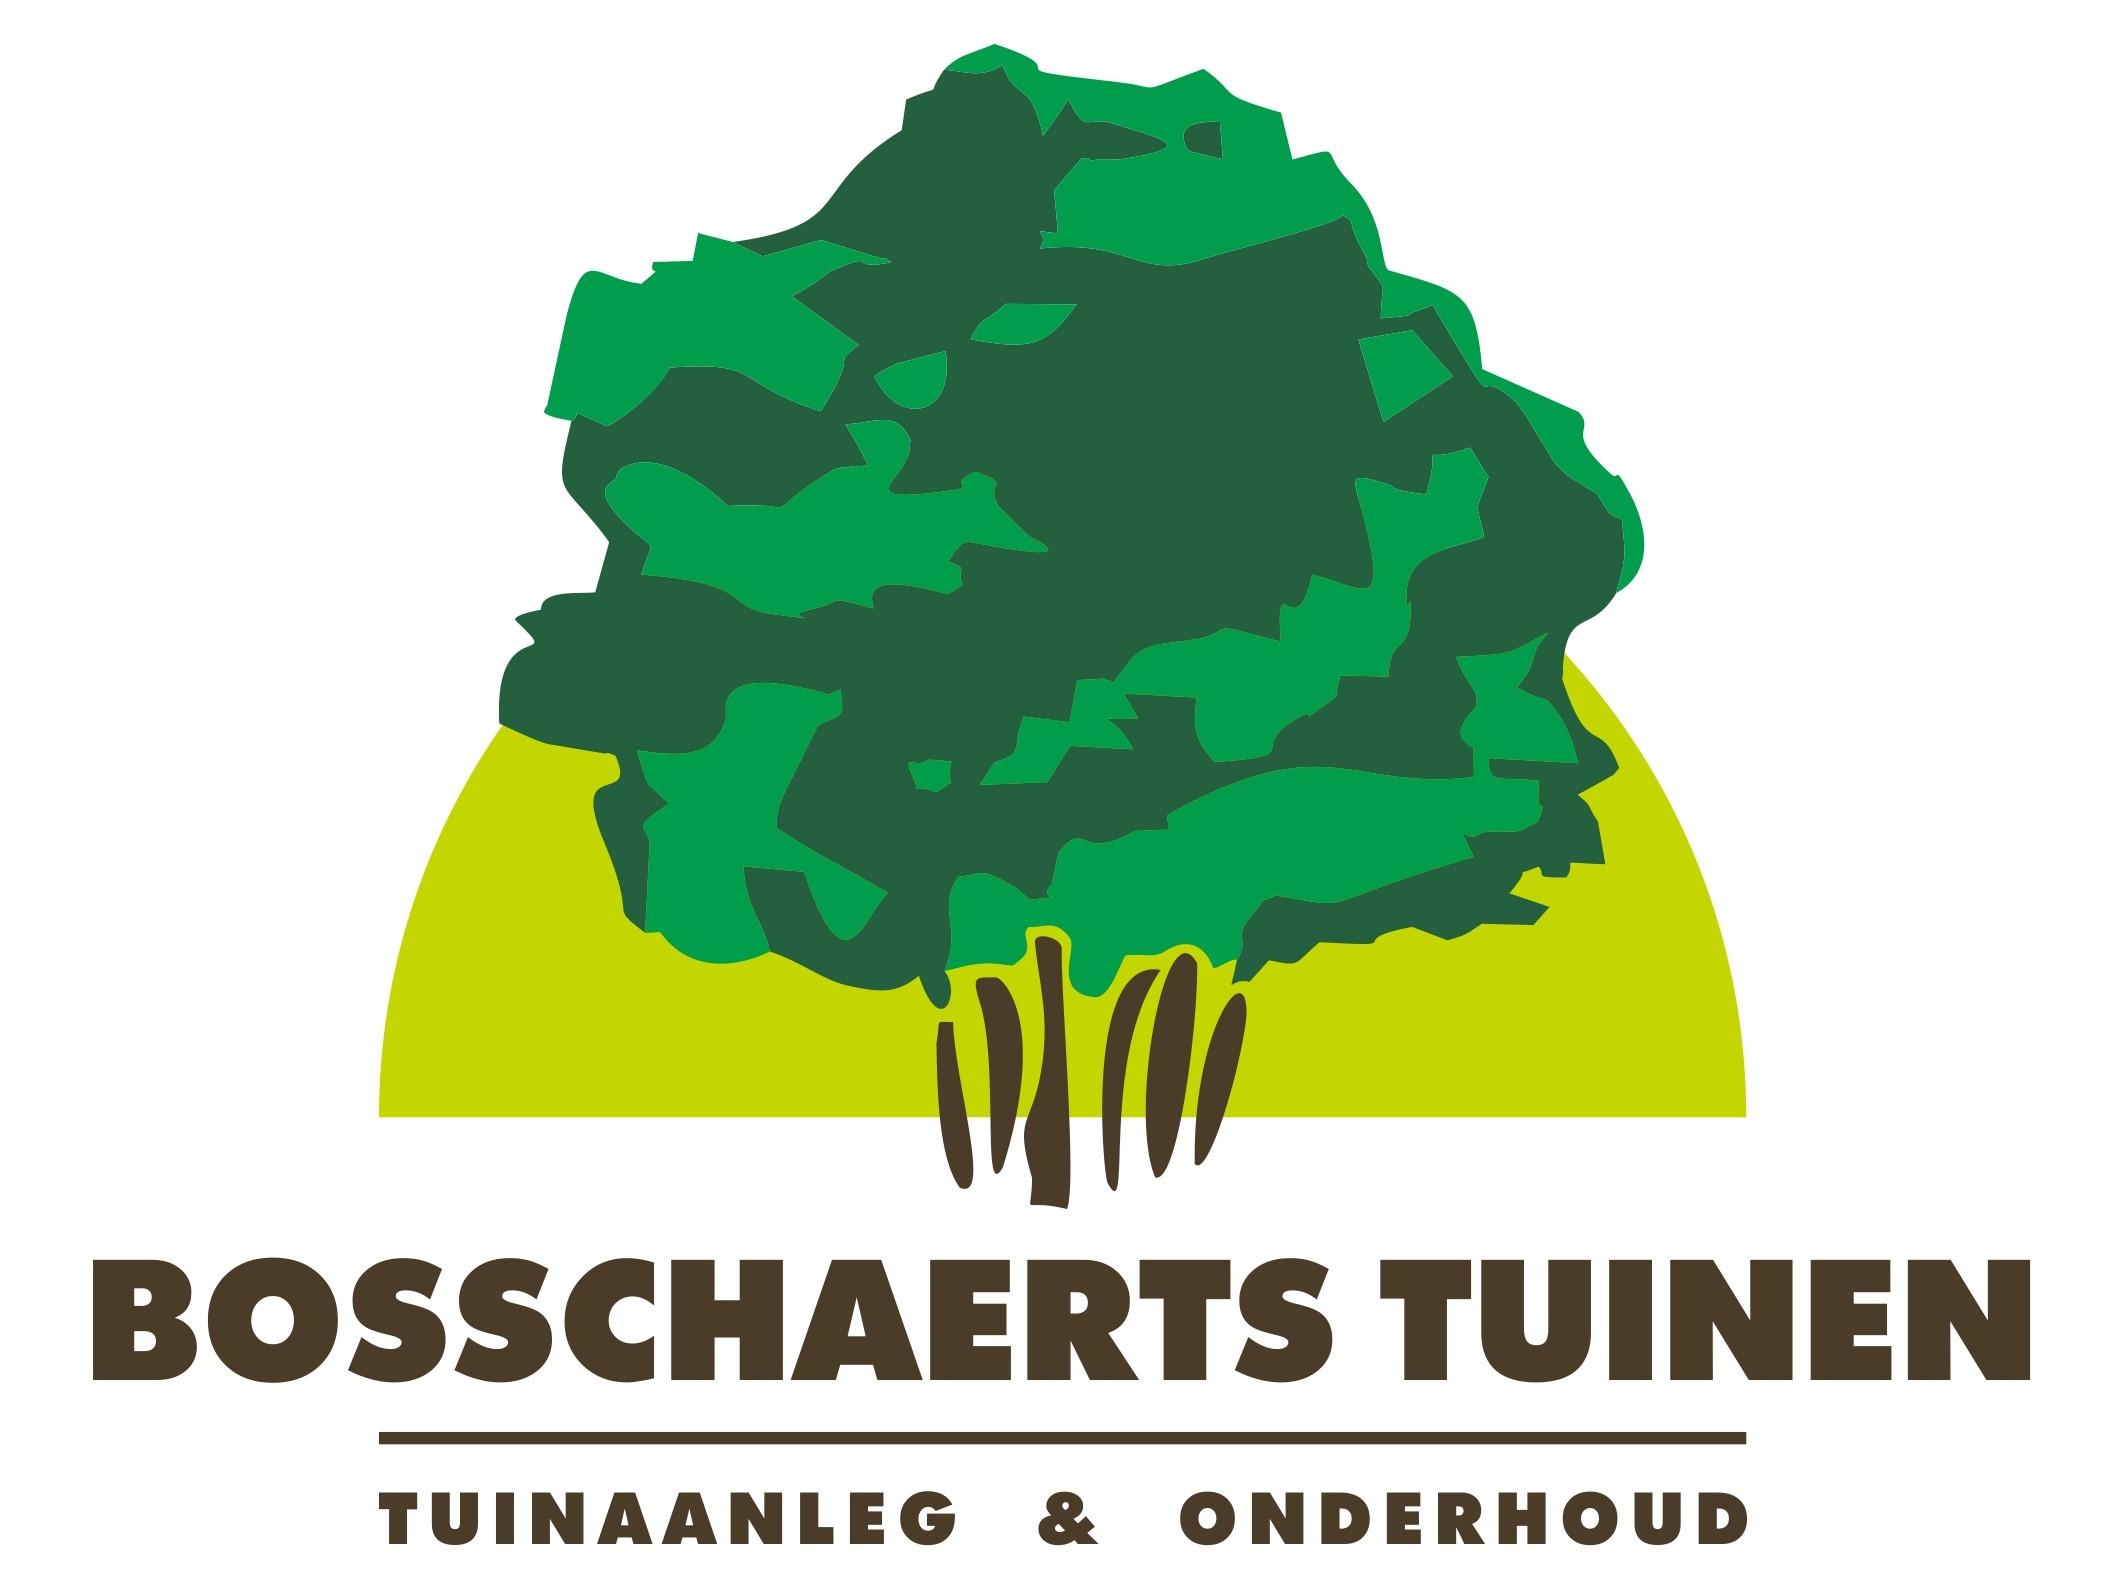 Bosschaerts Tuinen bvba